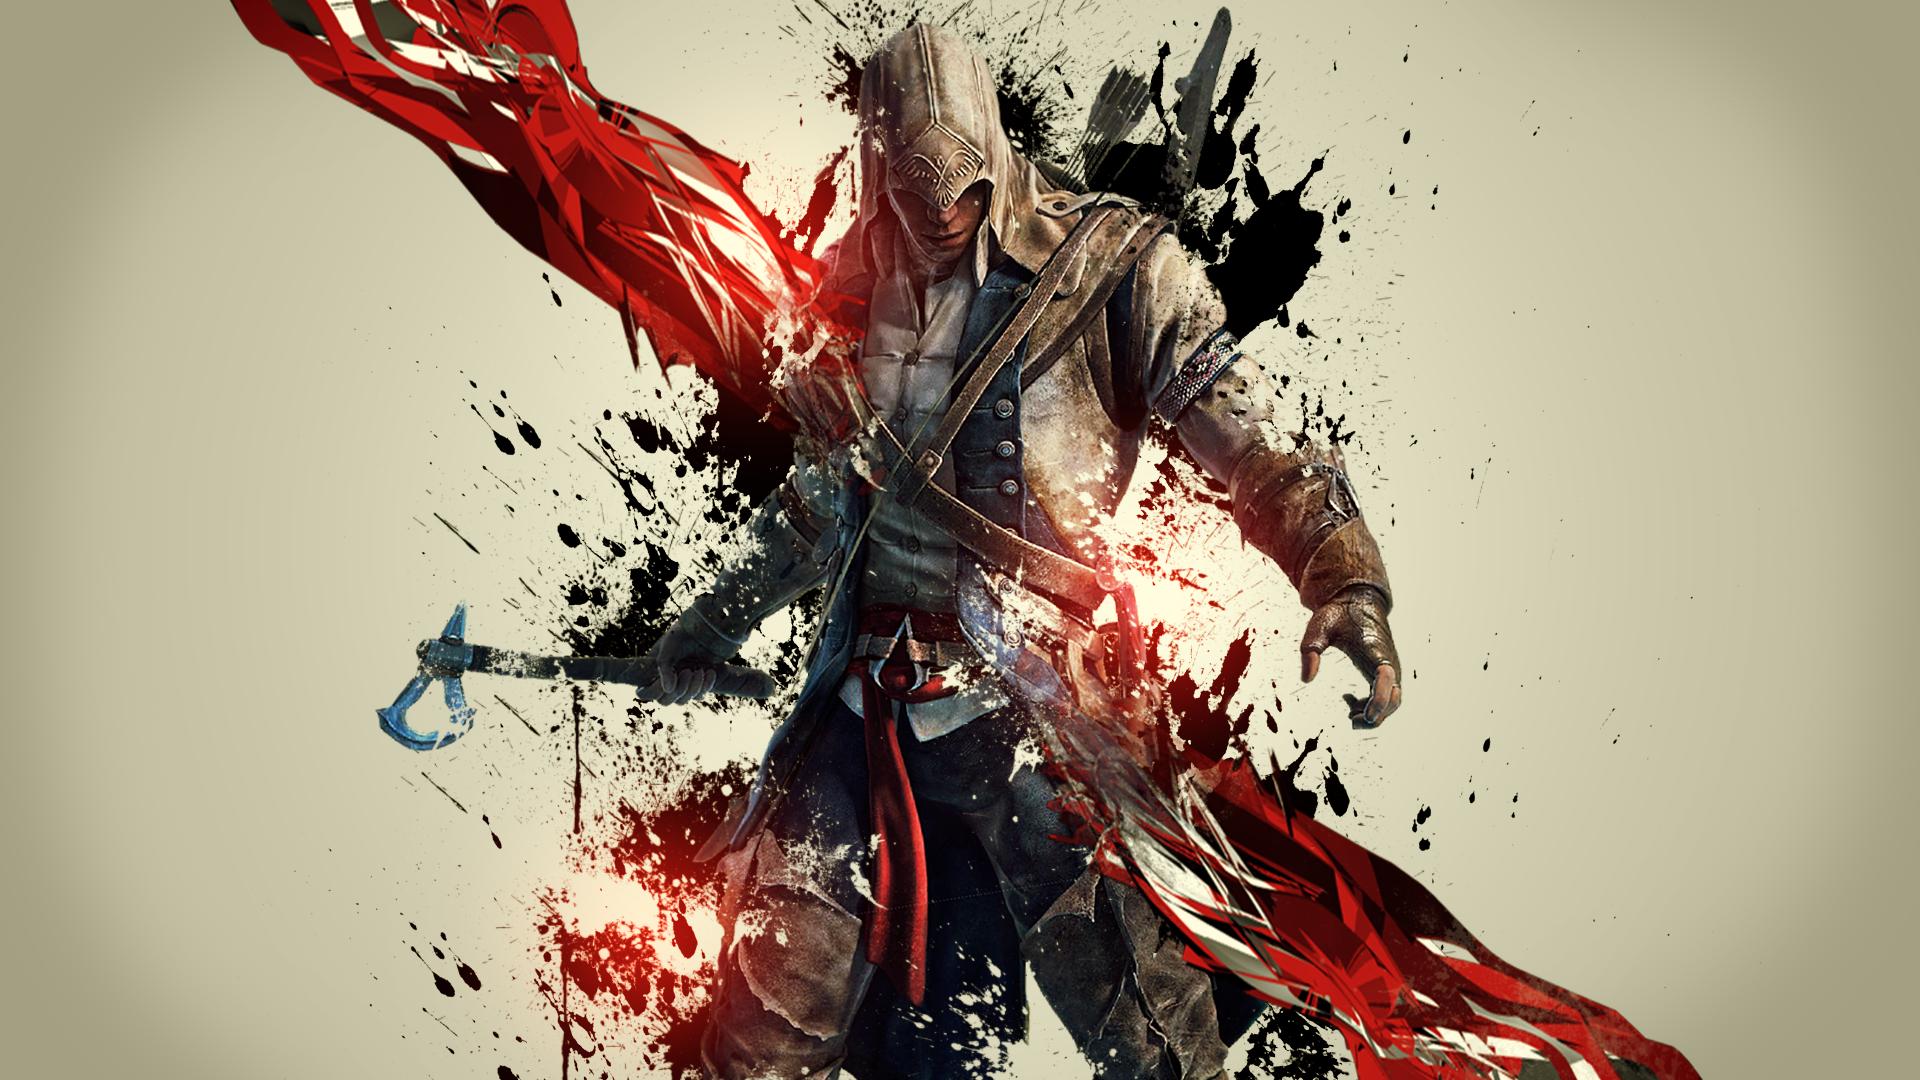 Assassins Creed III Computer Wallpapers, Desktop